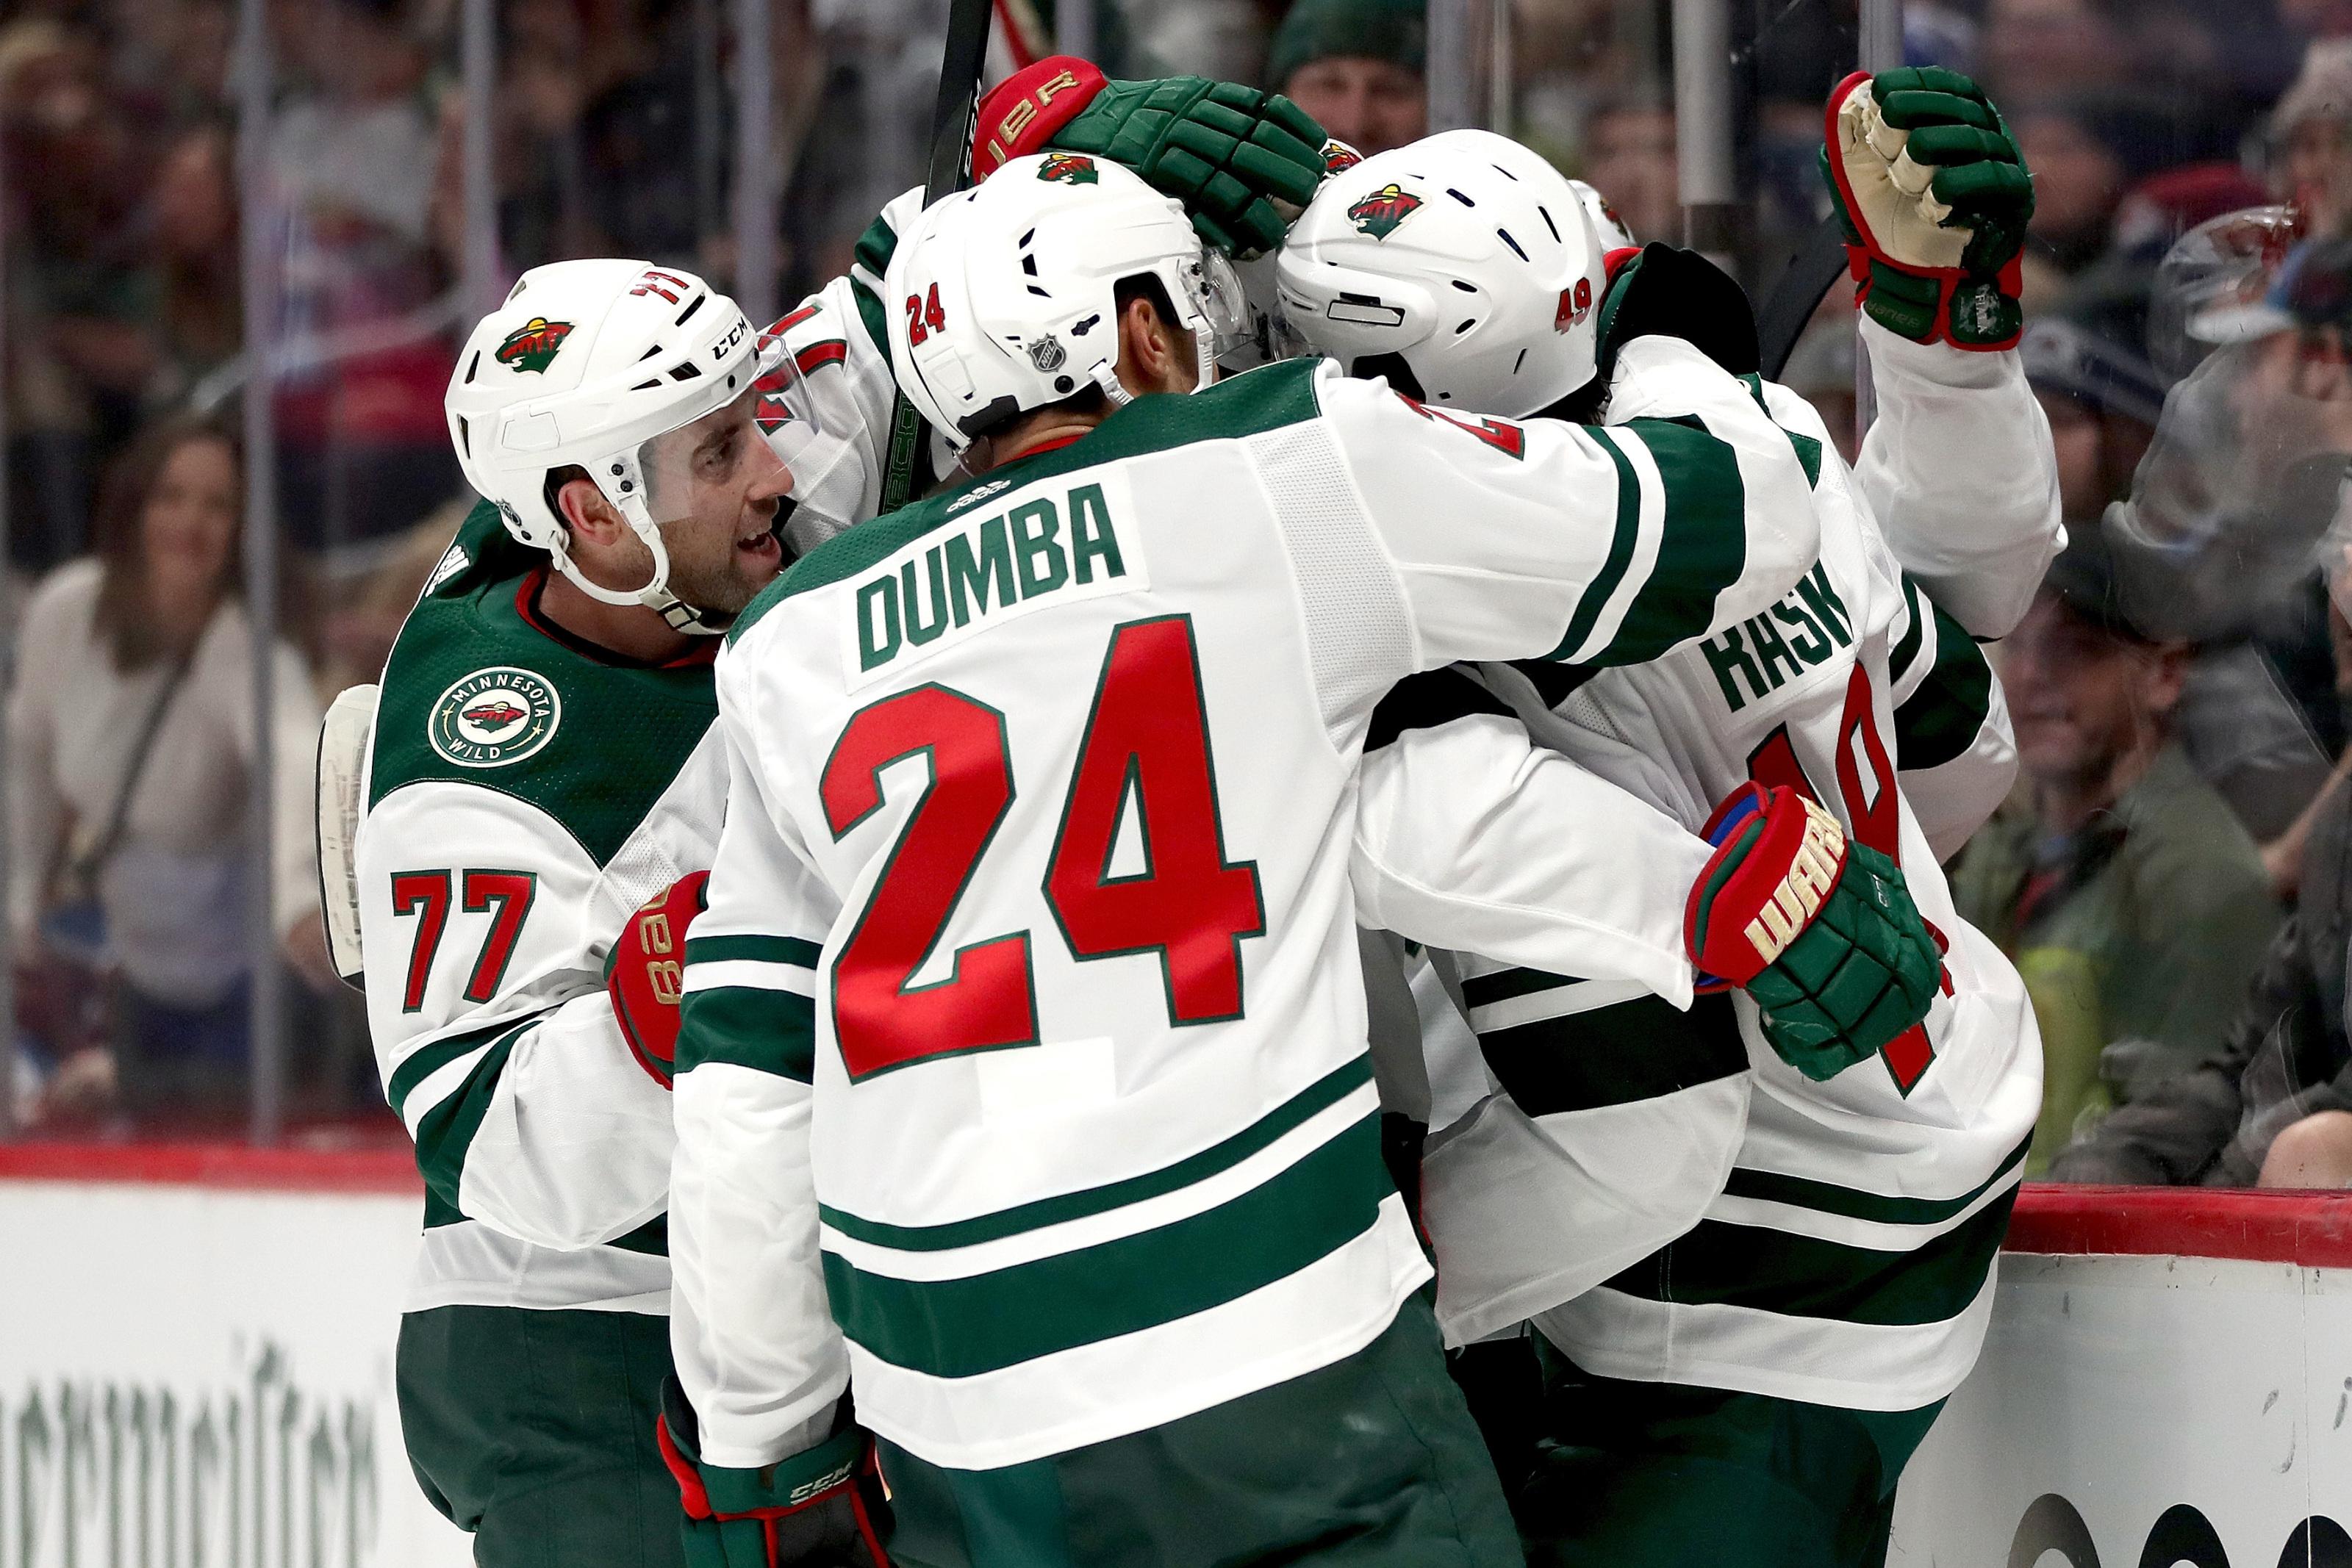 Top Five Moments of the Minnesota Wild's 2019-2020 Season- So Far